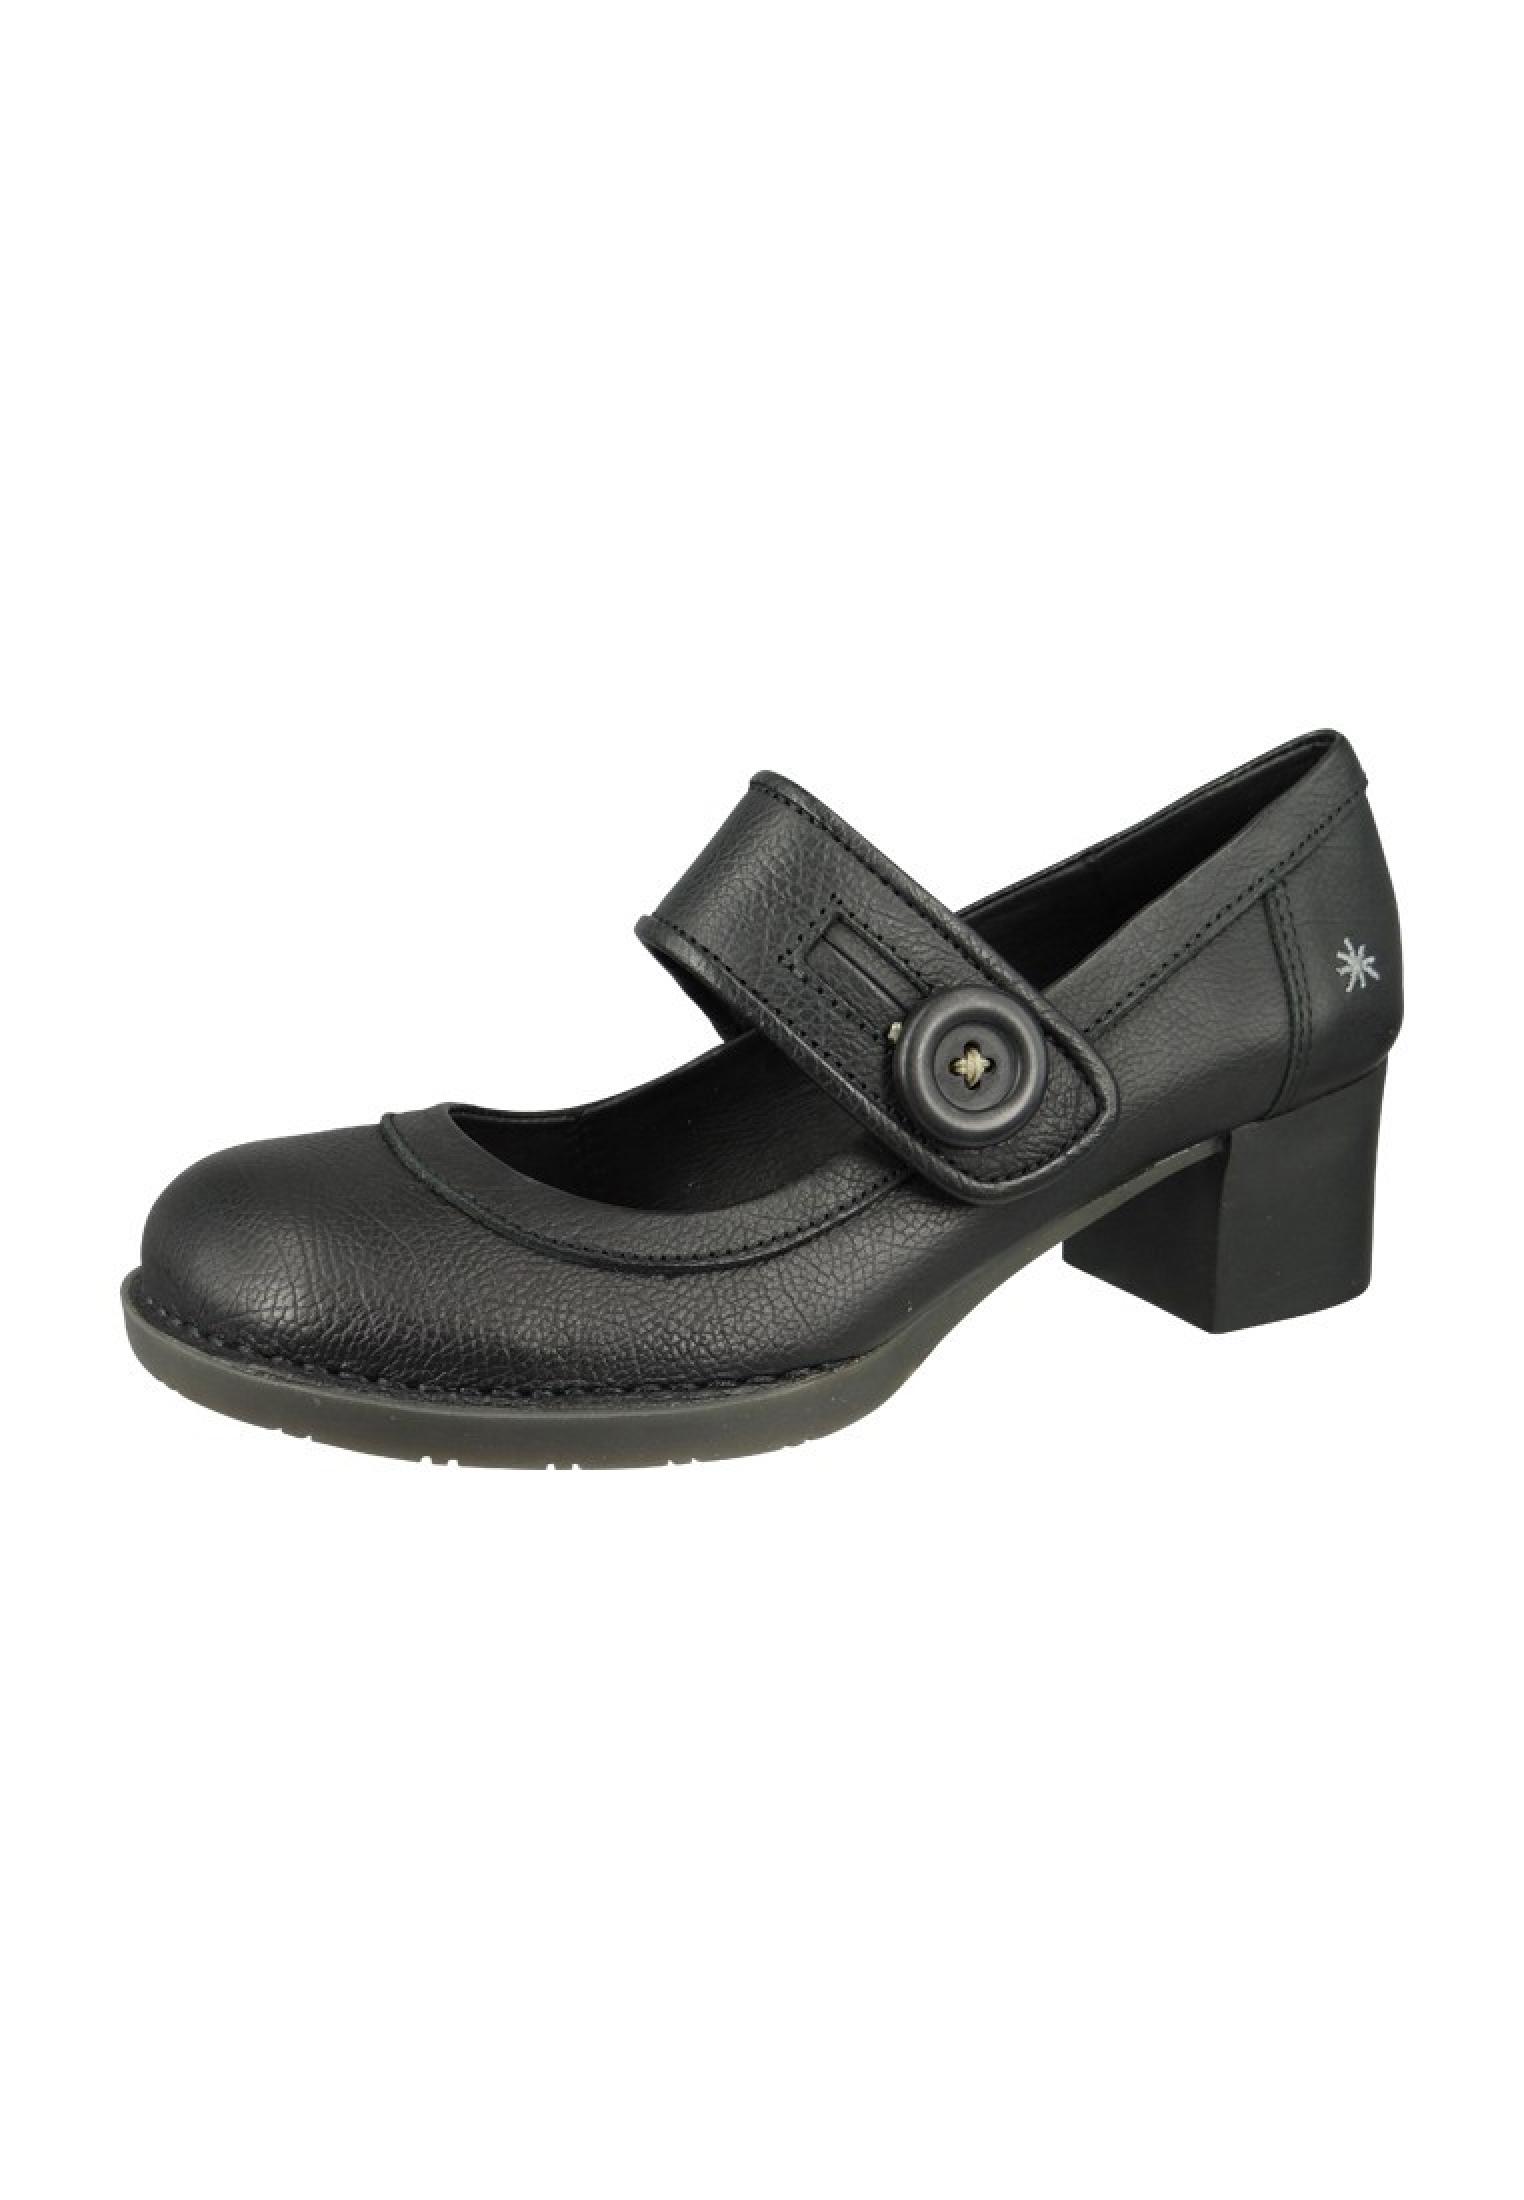 art schuhe leder pumps platform heels memphis bristol schwarz black 0089 damenschuhe pumps. Black Bedroom Furniture Sets. Home Design Ideas